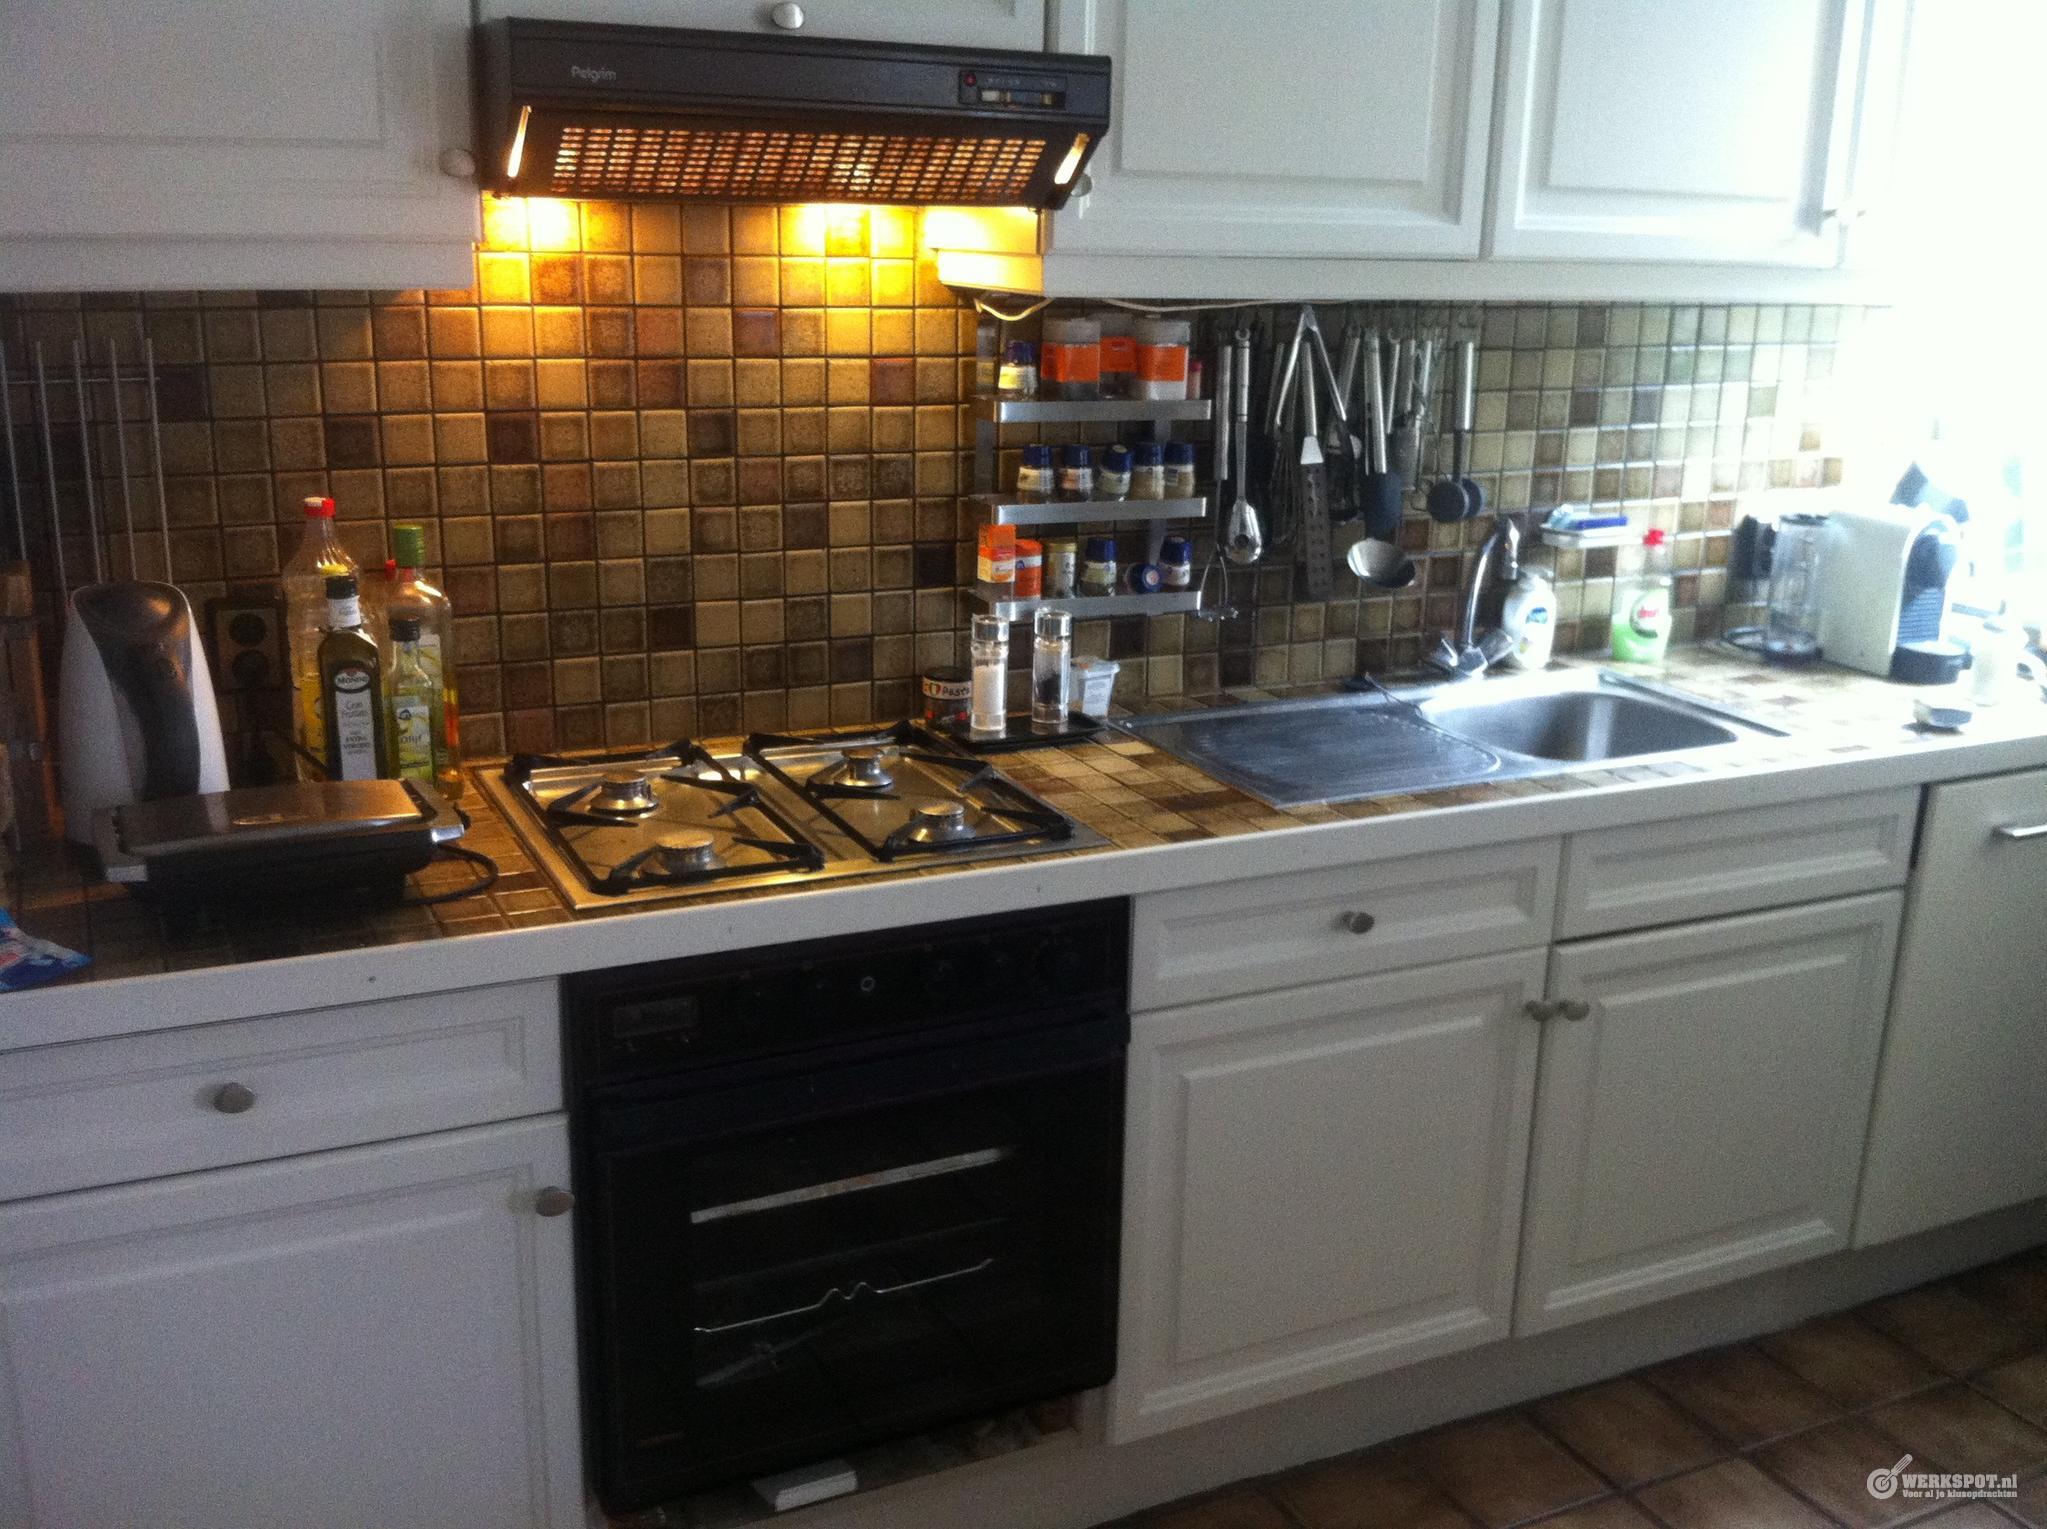 Keuken Renoveren Friesland : Keuken renoveren franeker keralit gevelbekleding buwalda schettens